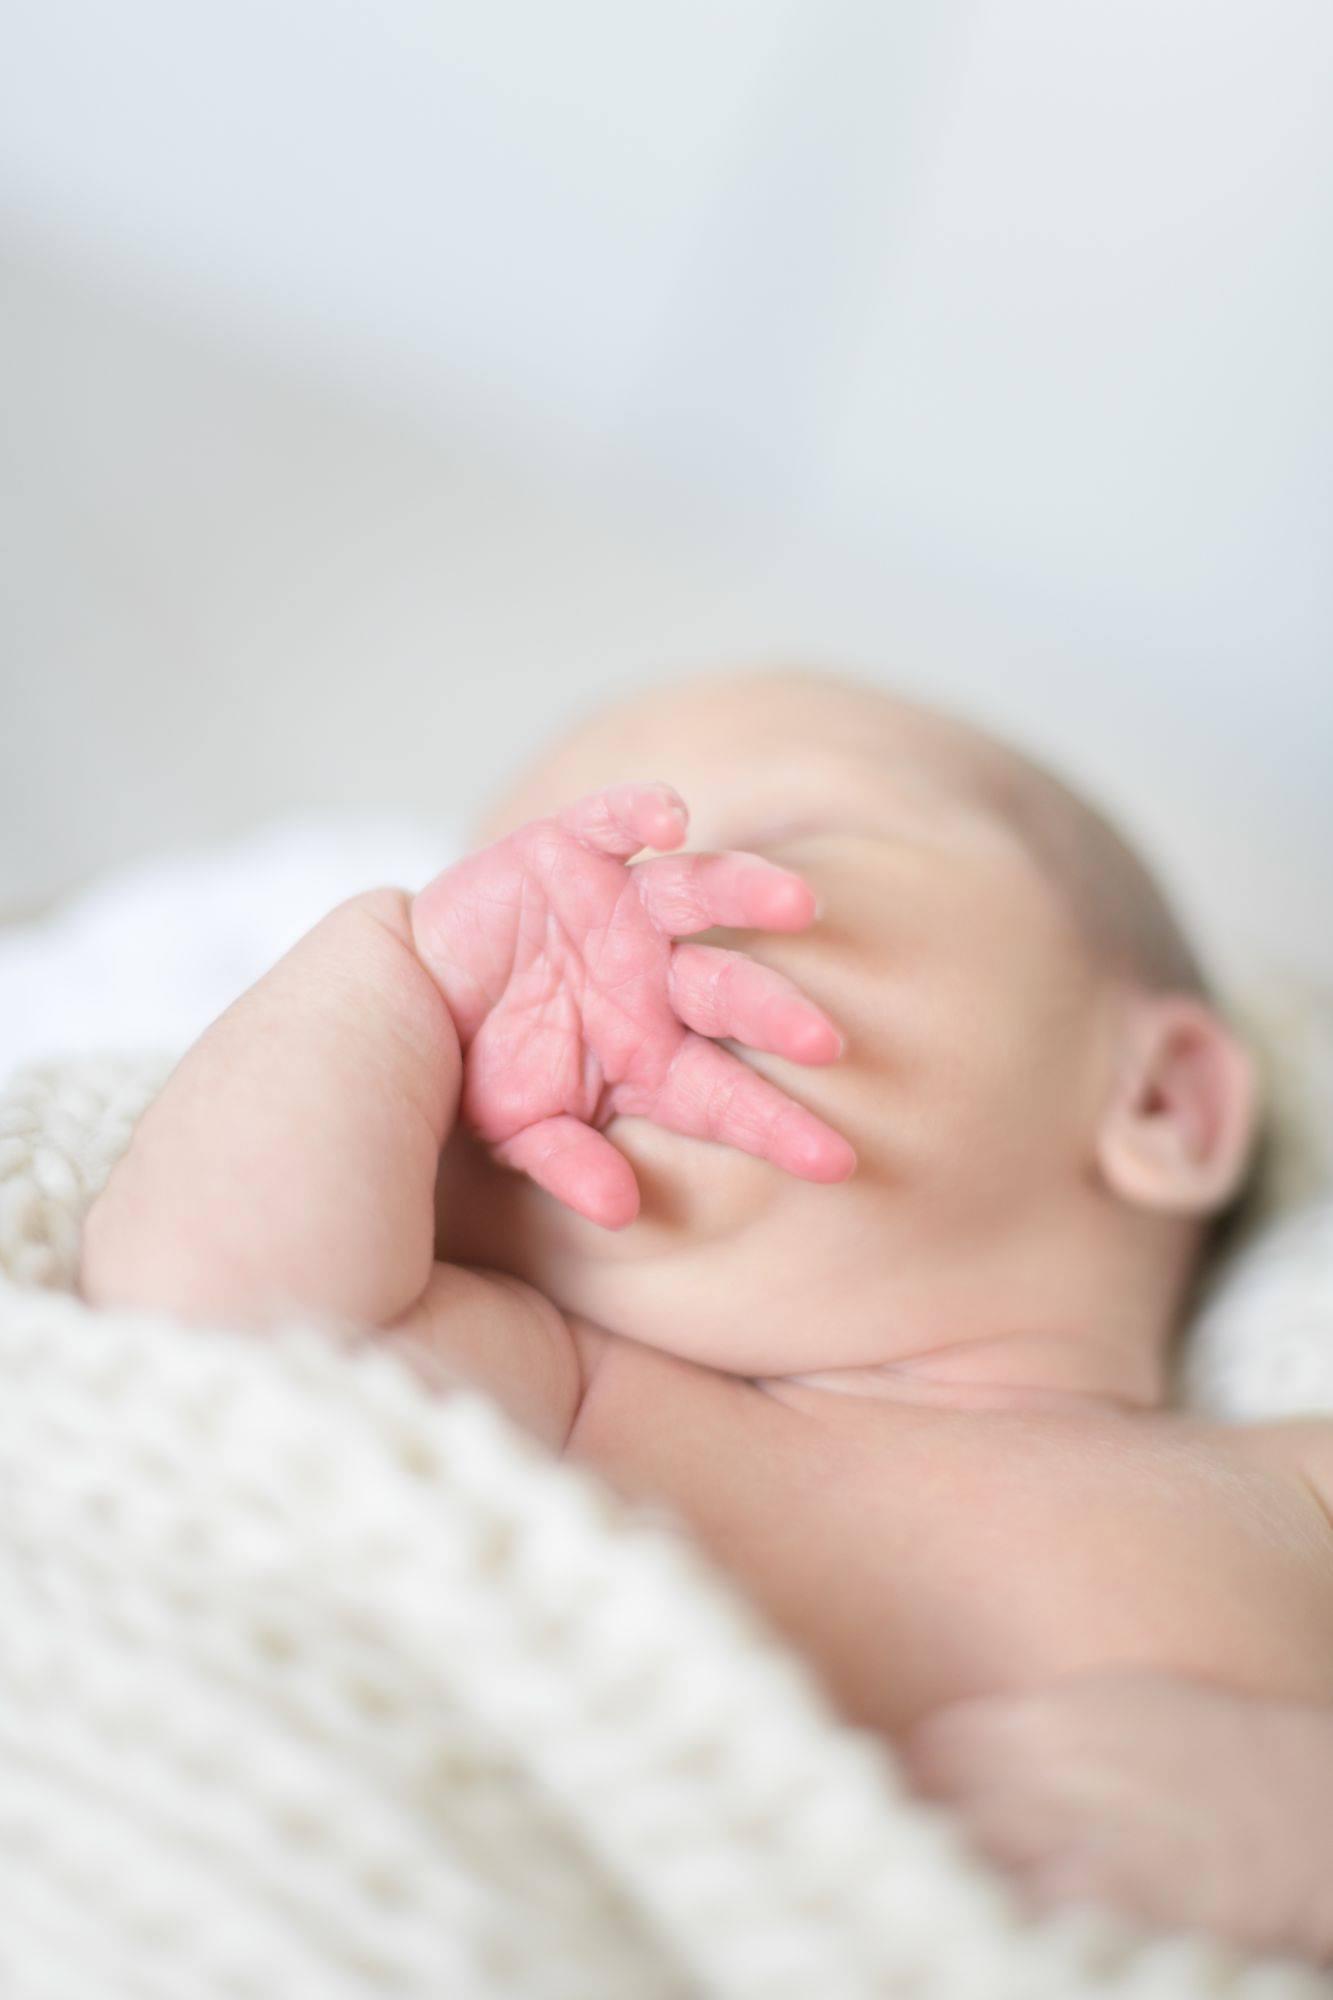 priscillapuzenat-photographe-portrait-famille-naissance-maternite-bebe-charbuy-yonne-bourgogne-france